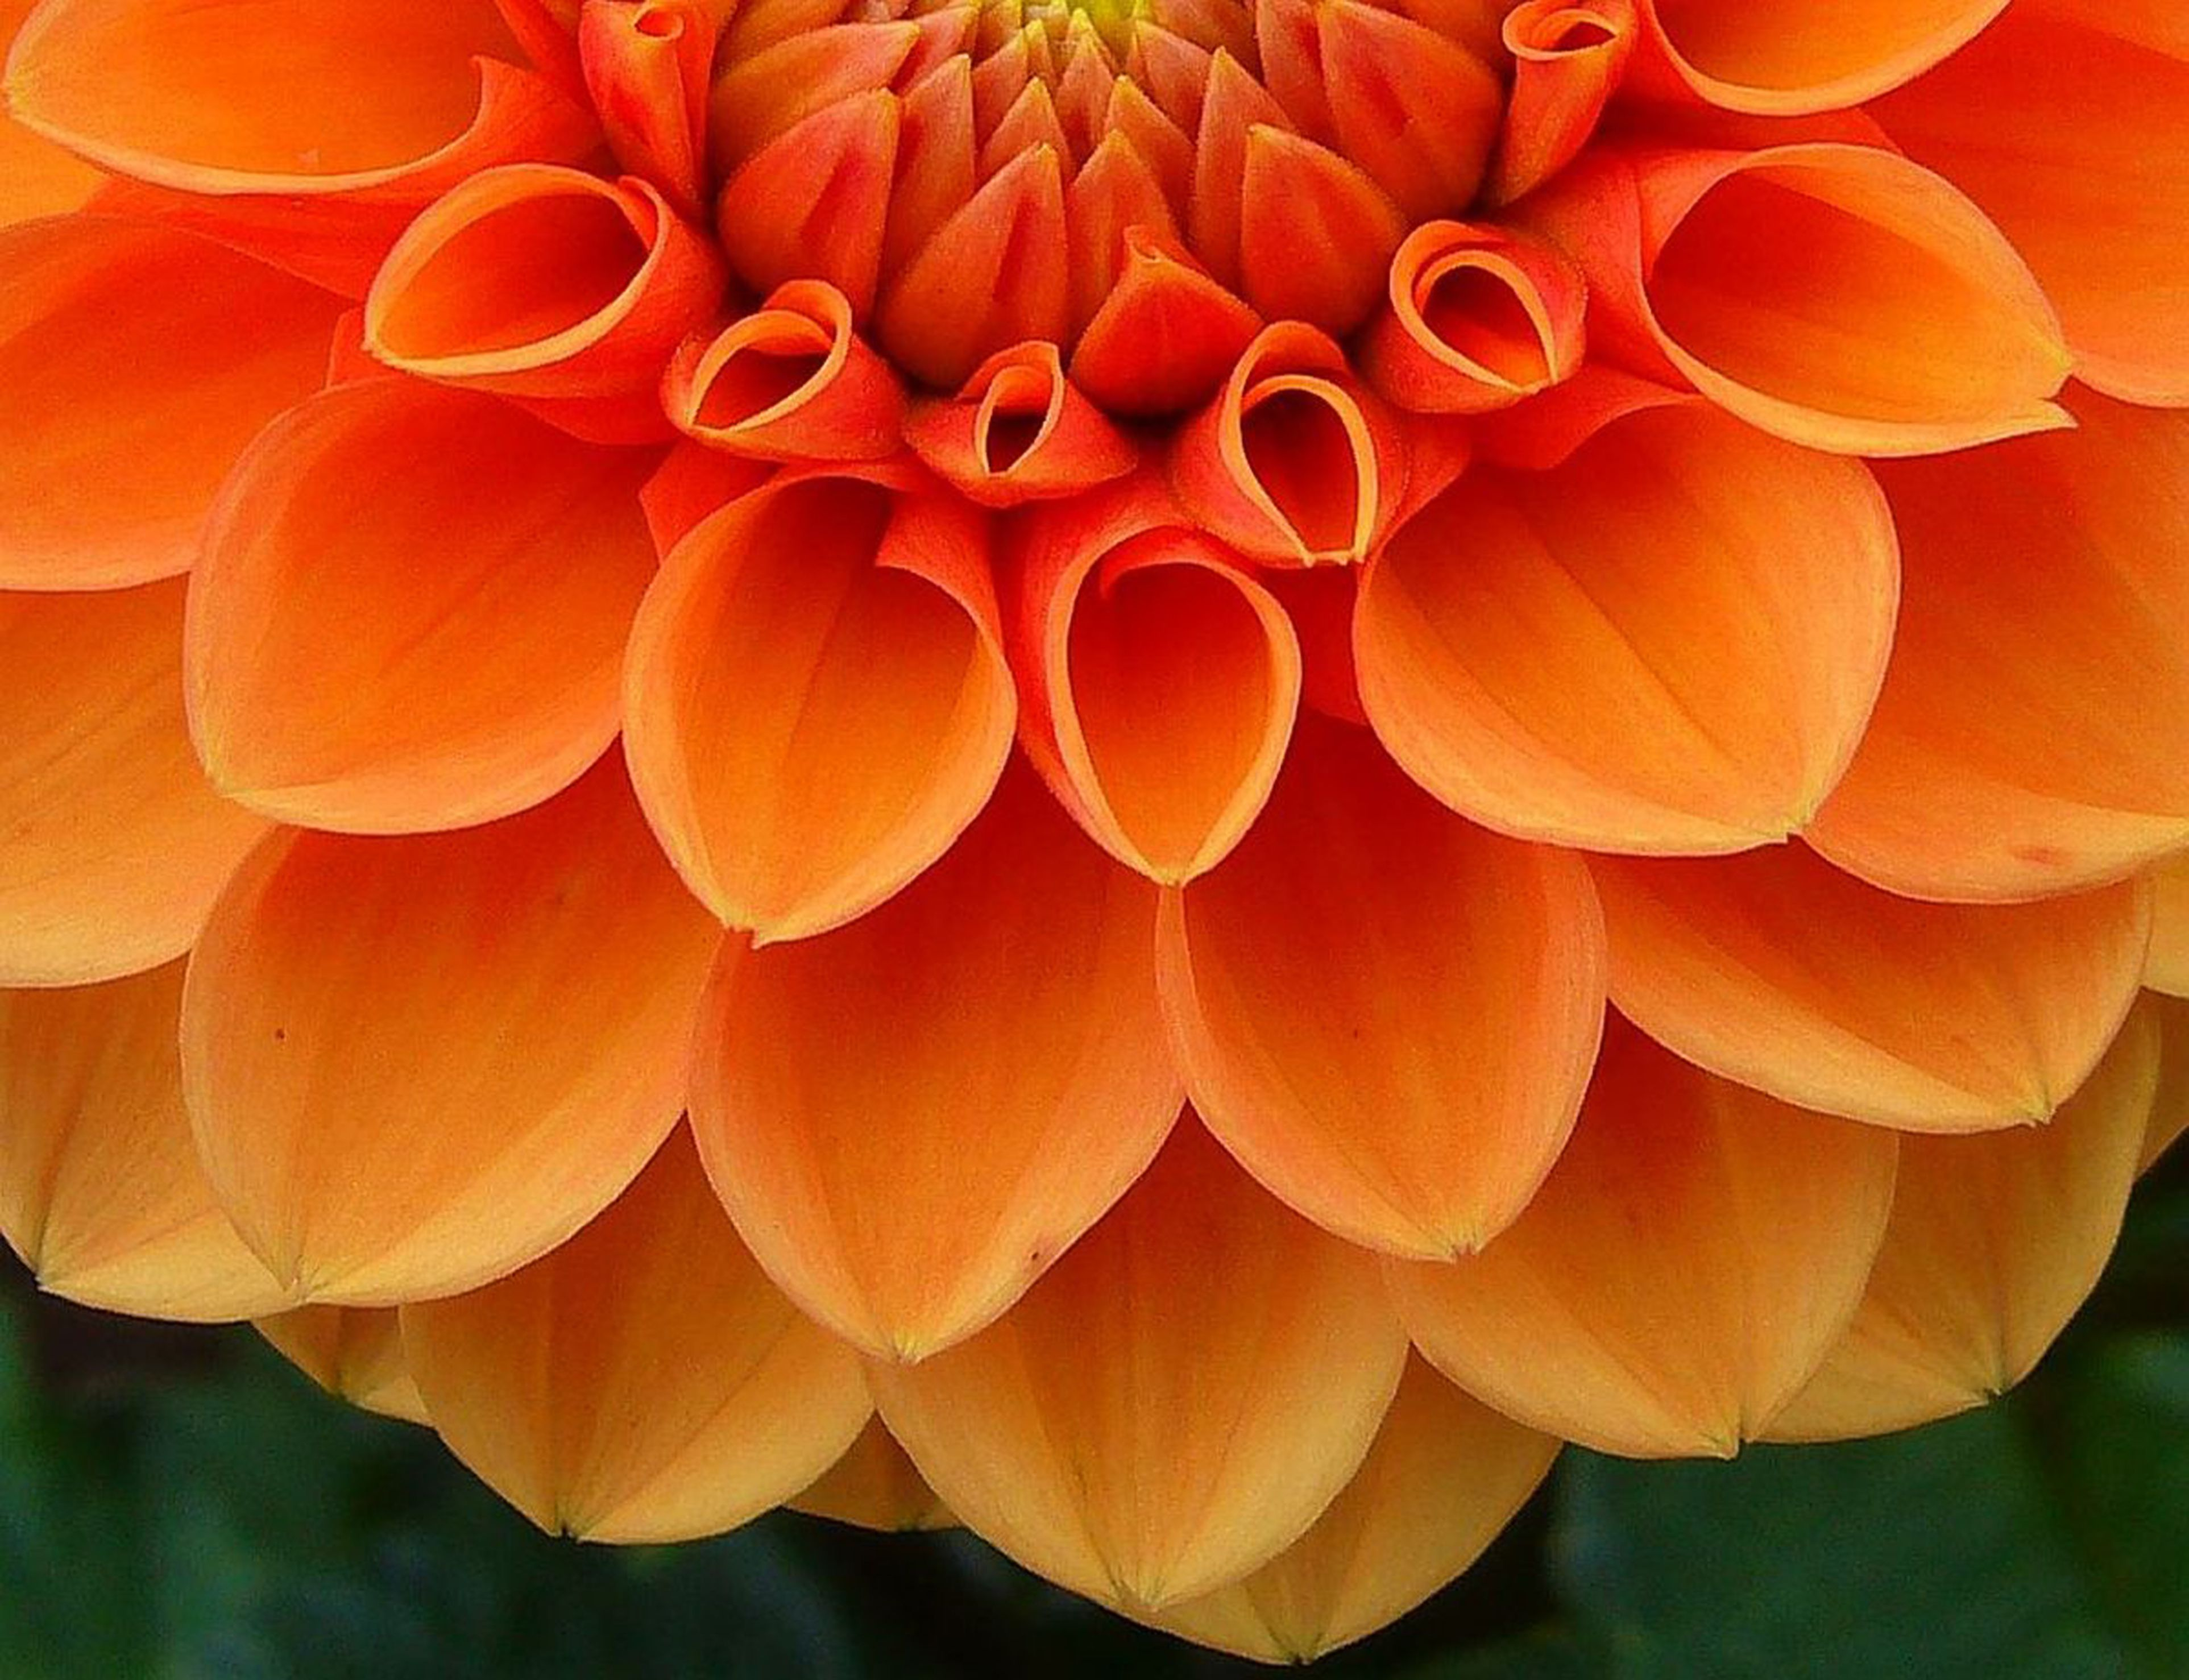 Dahlia sunkist orange honeycomb